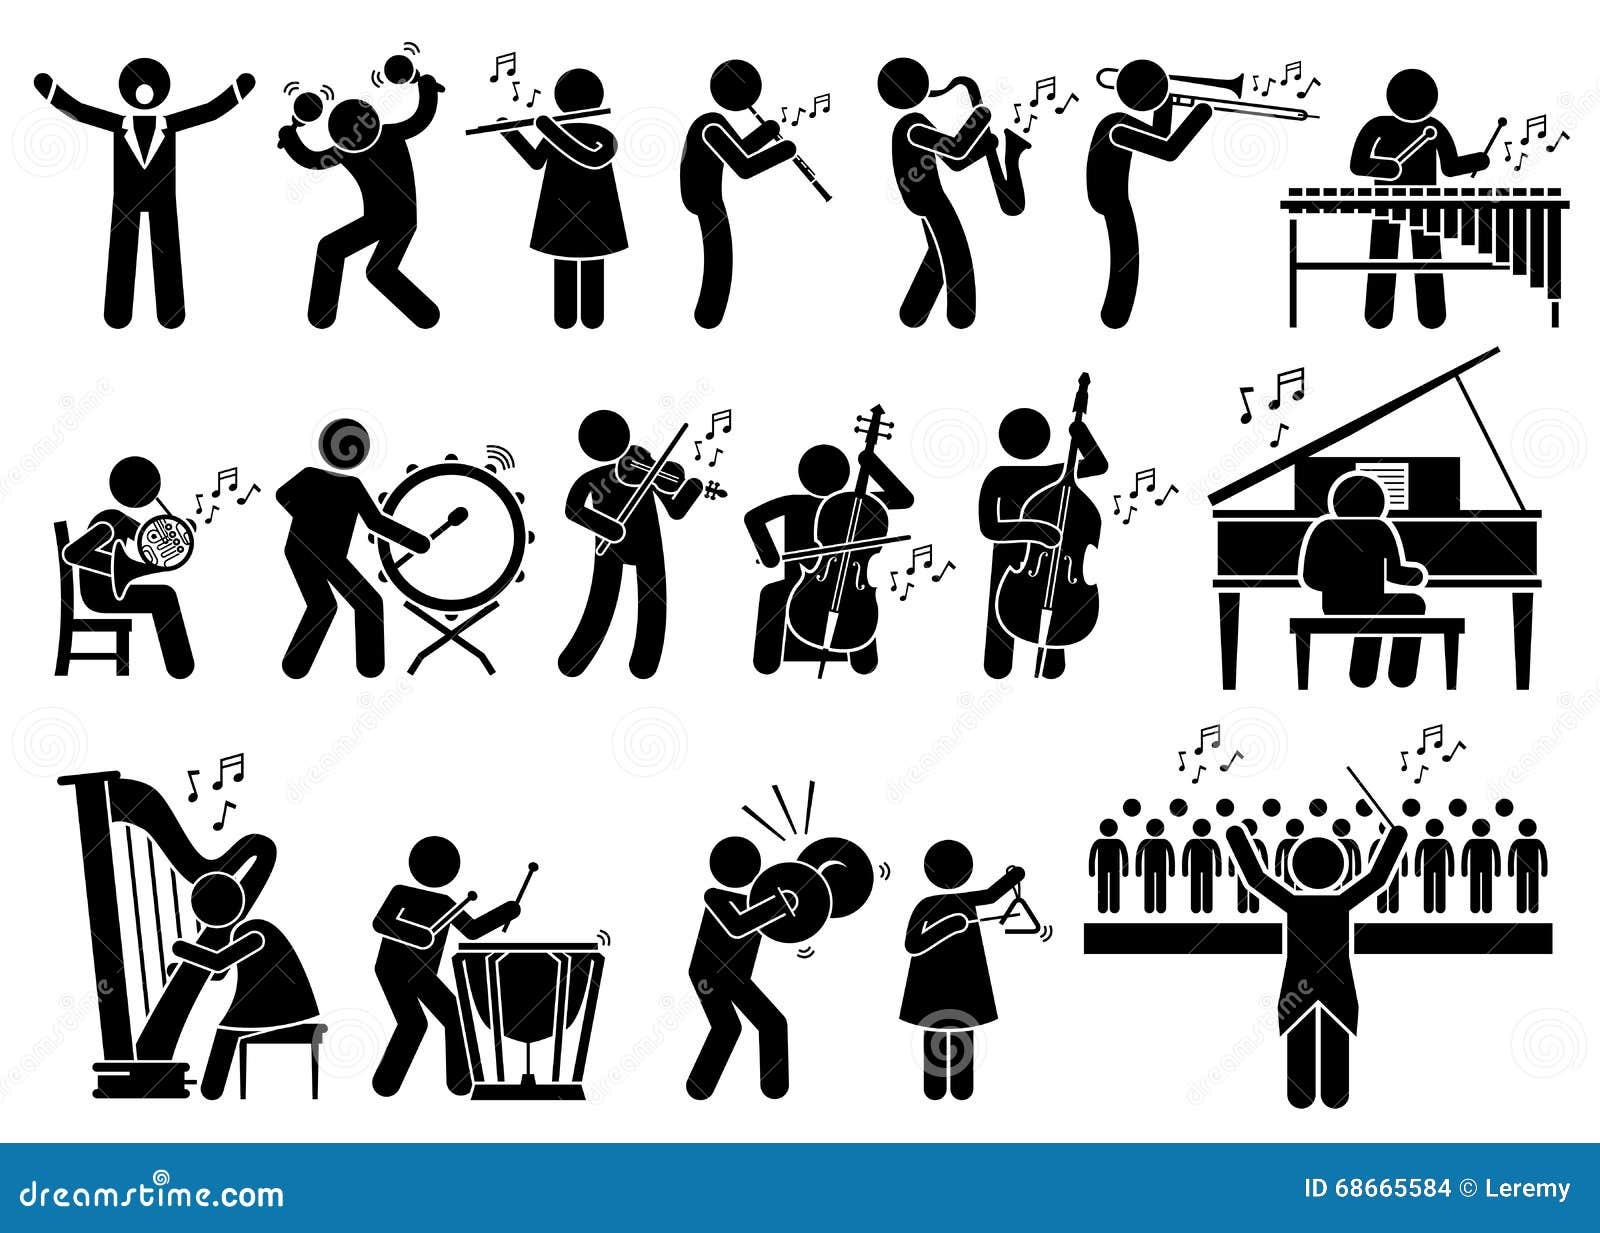 ... Abbildung: Orchester-Symphonie-Musiker mit Musikinstrumenten Clipart